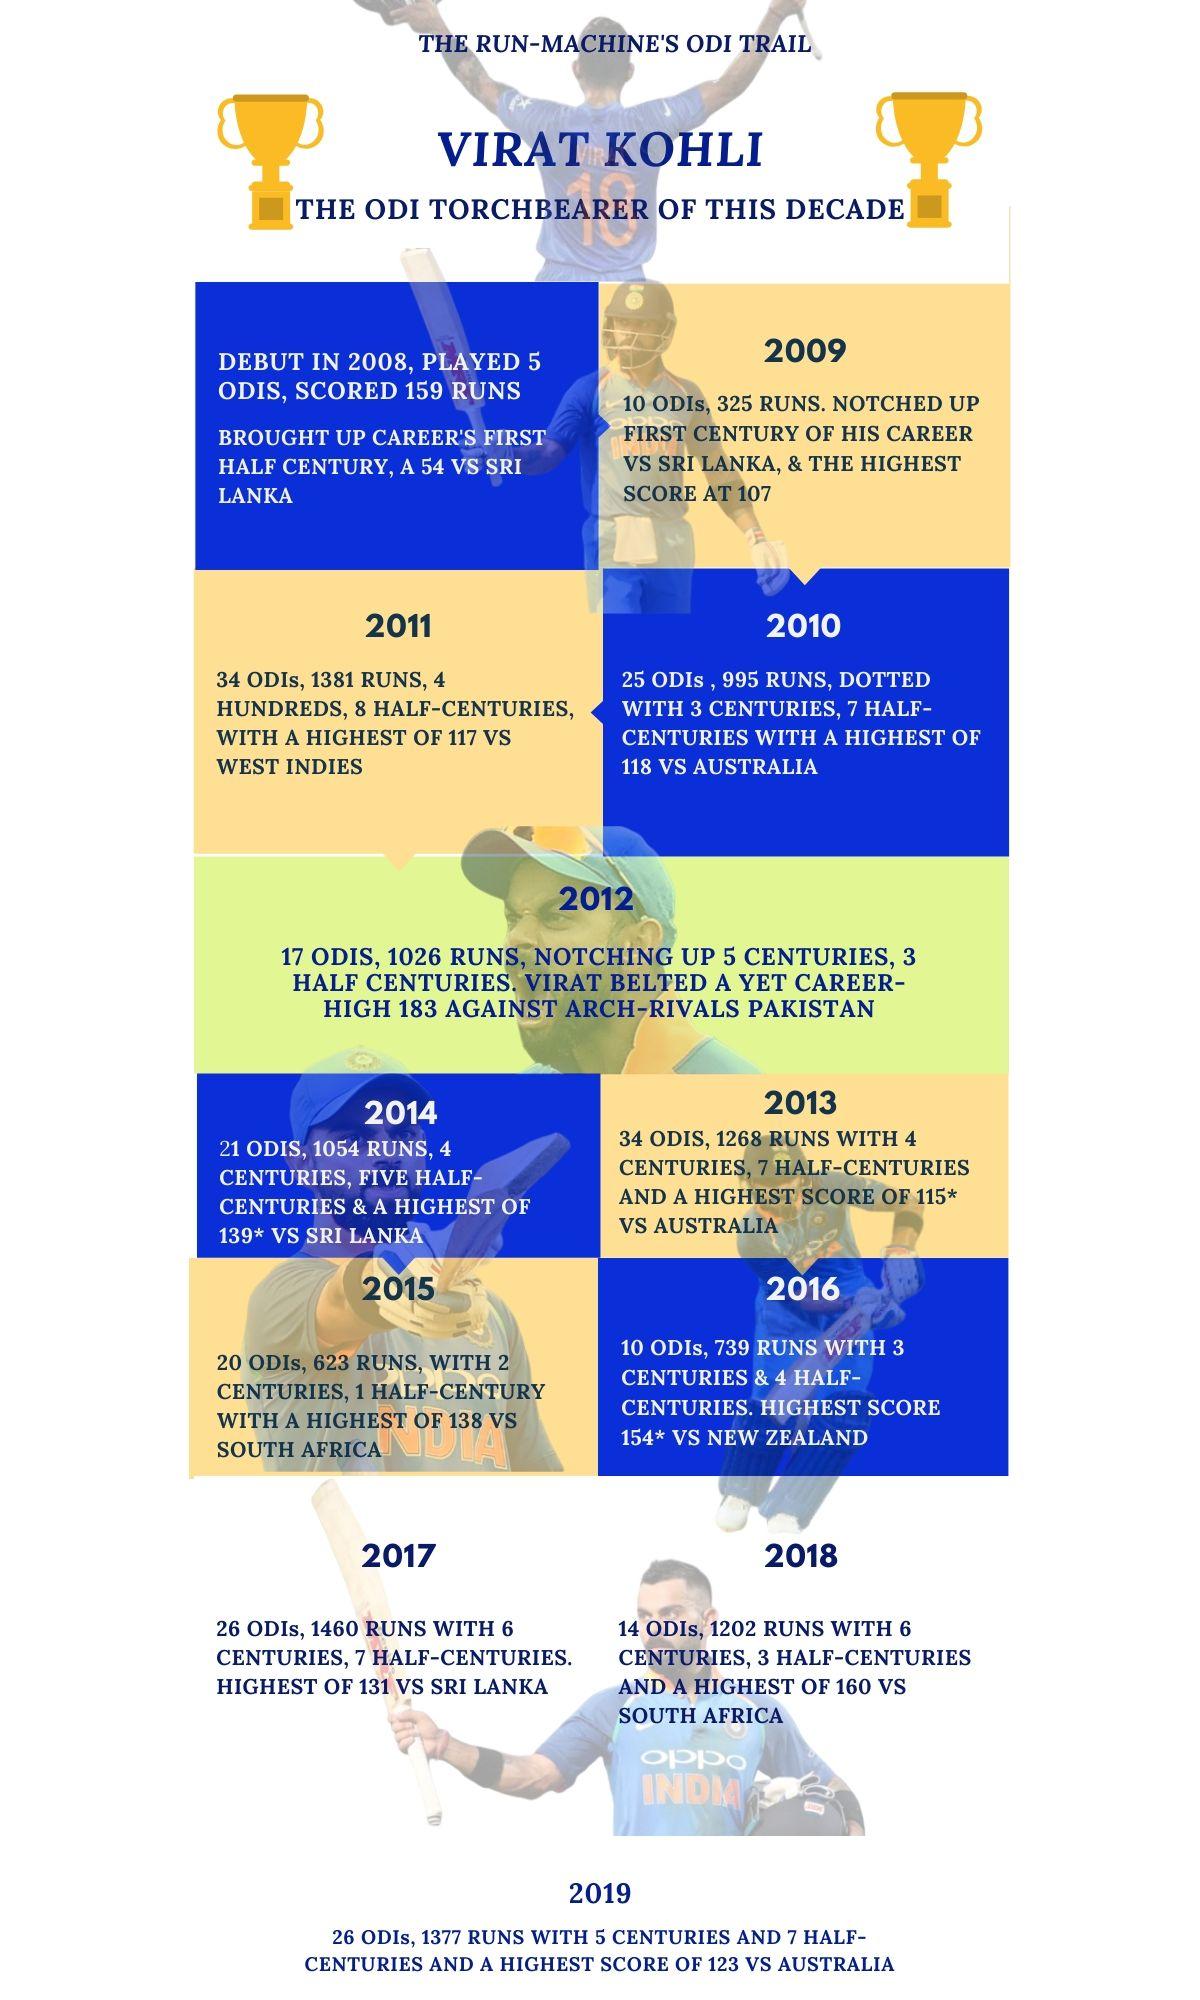 infographic-of-virat-kohli-since-his-debut